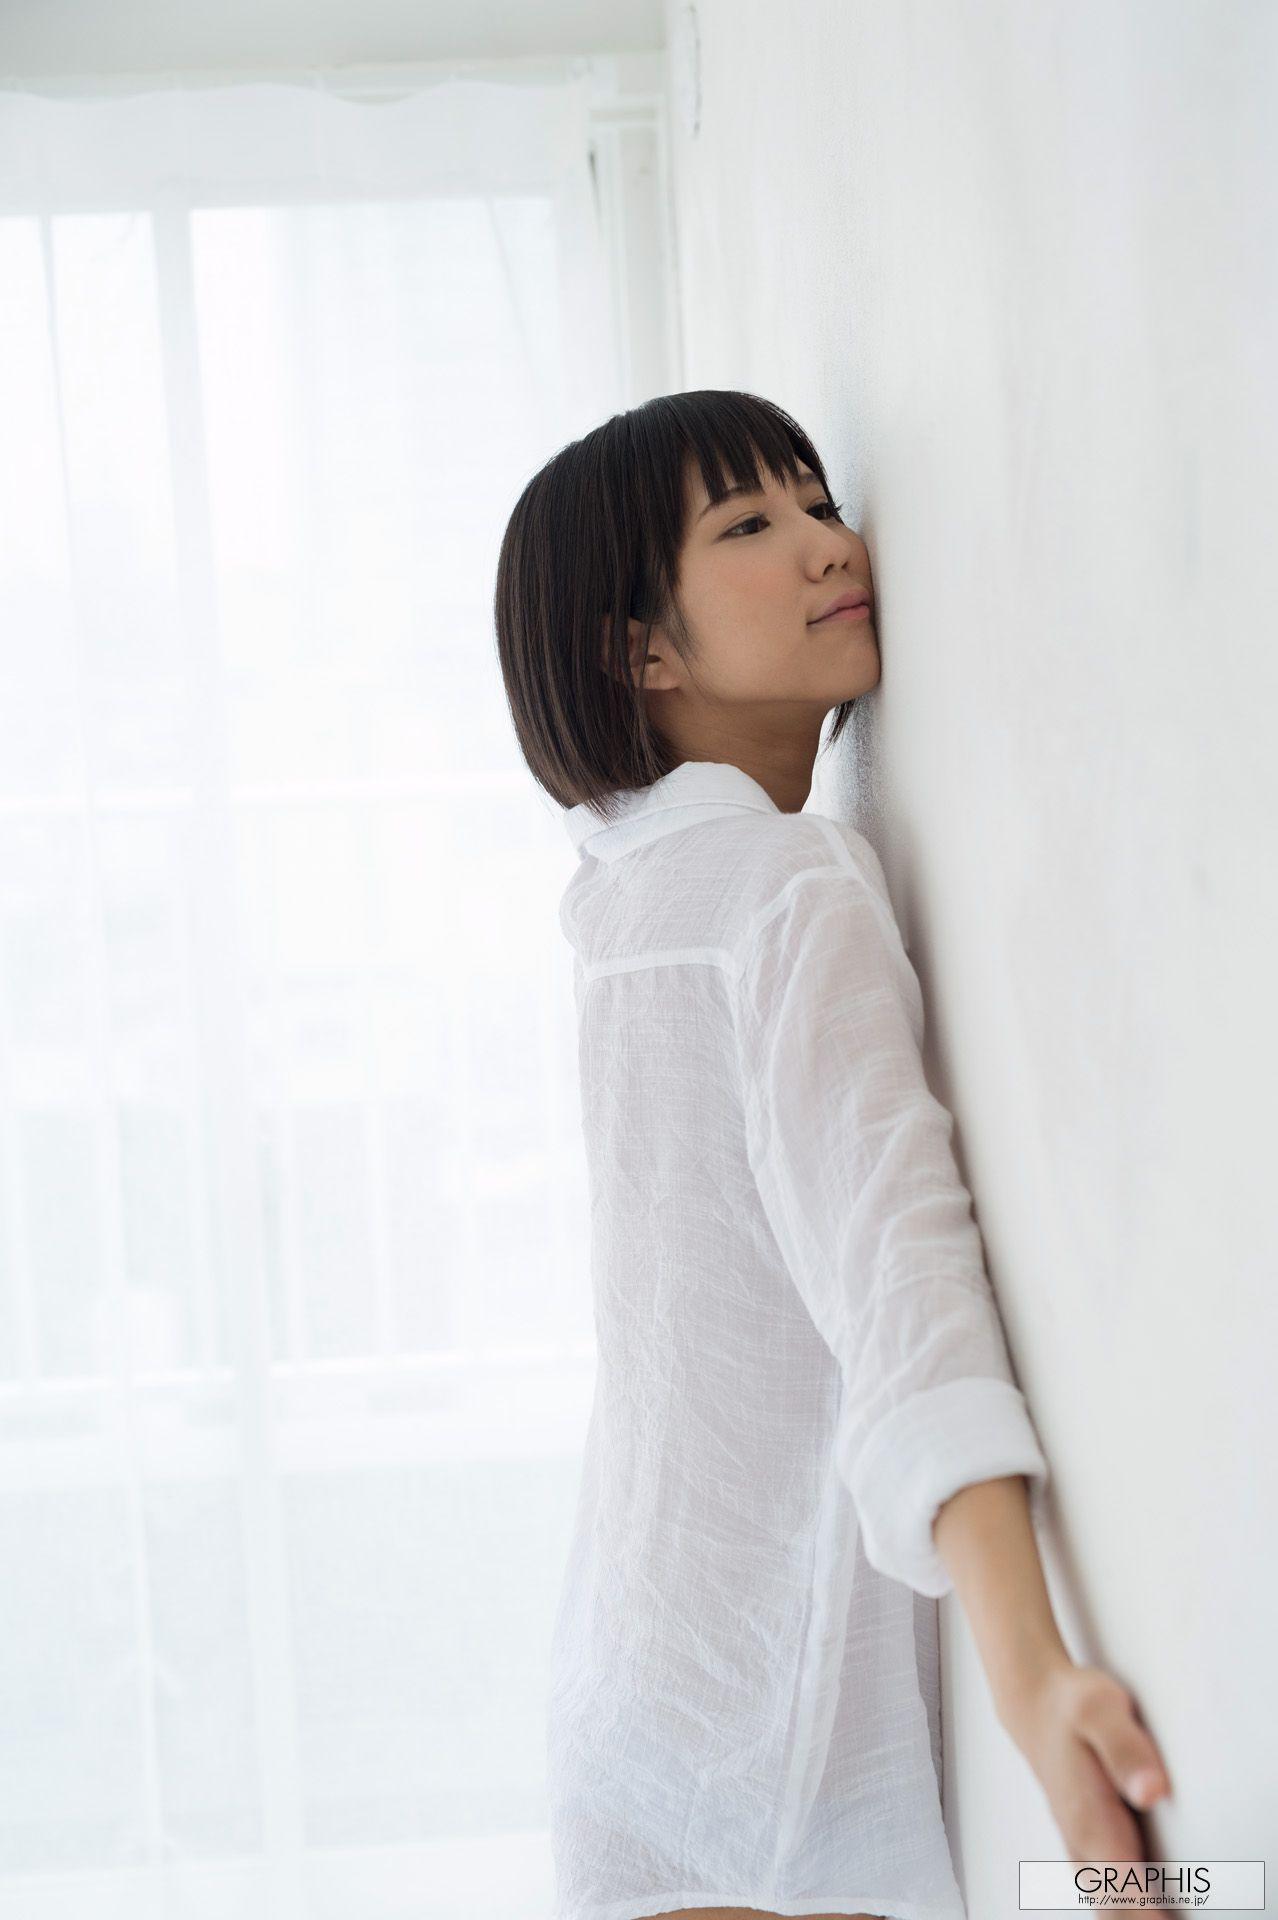 VOL.255 [Graphis]短发日本萌妹子:凑莉久(湊莉久)超高清写真套图(41P)